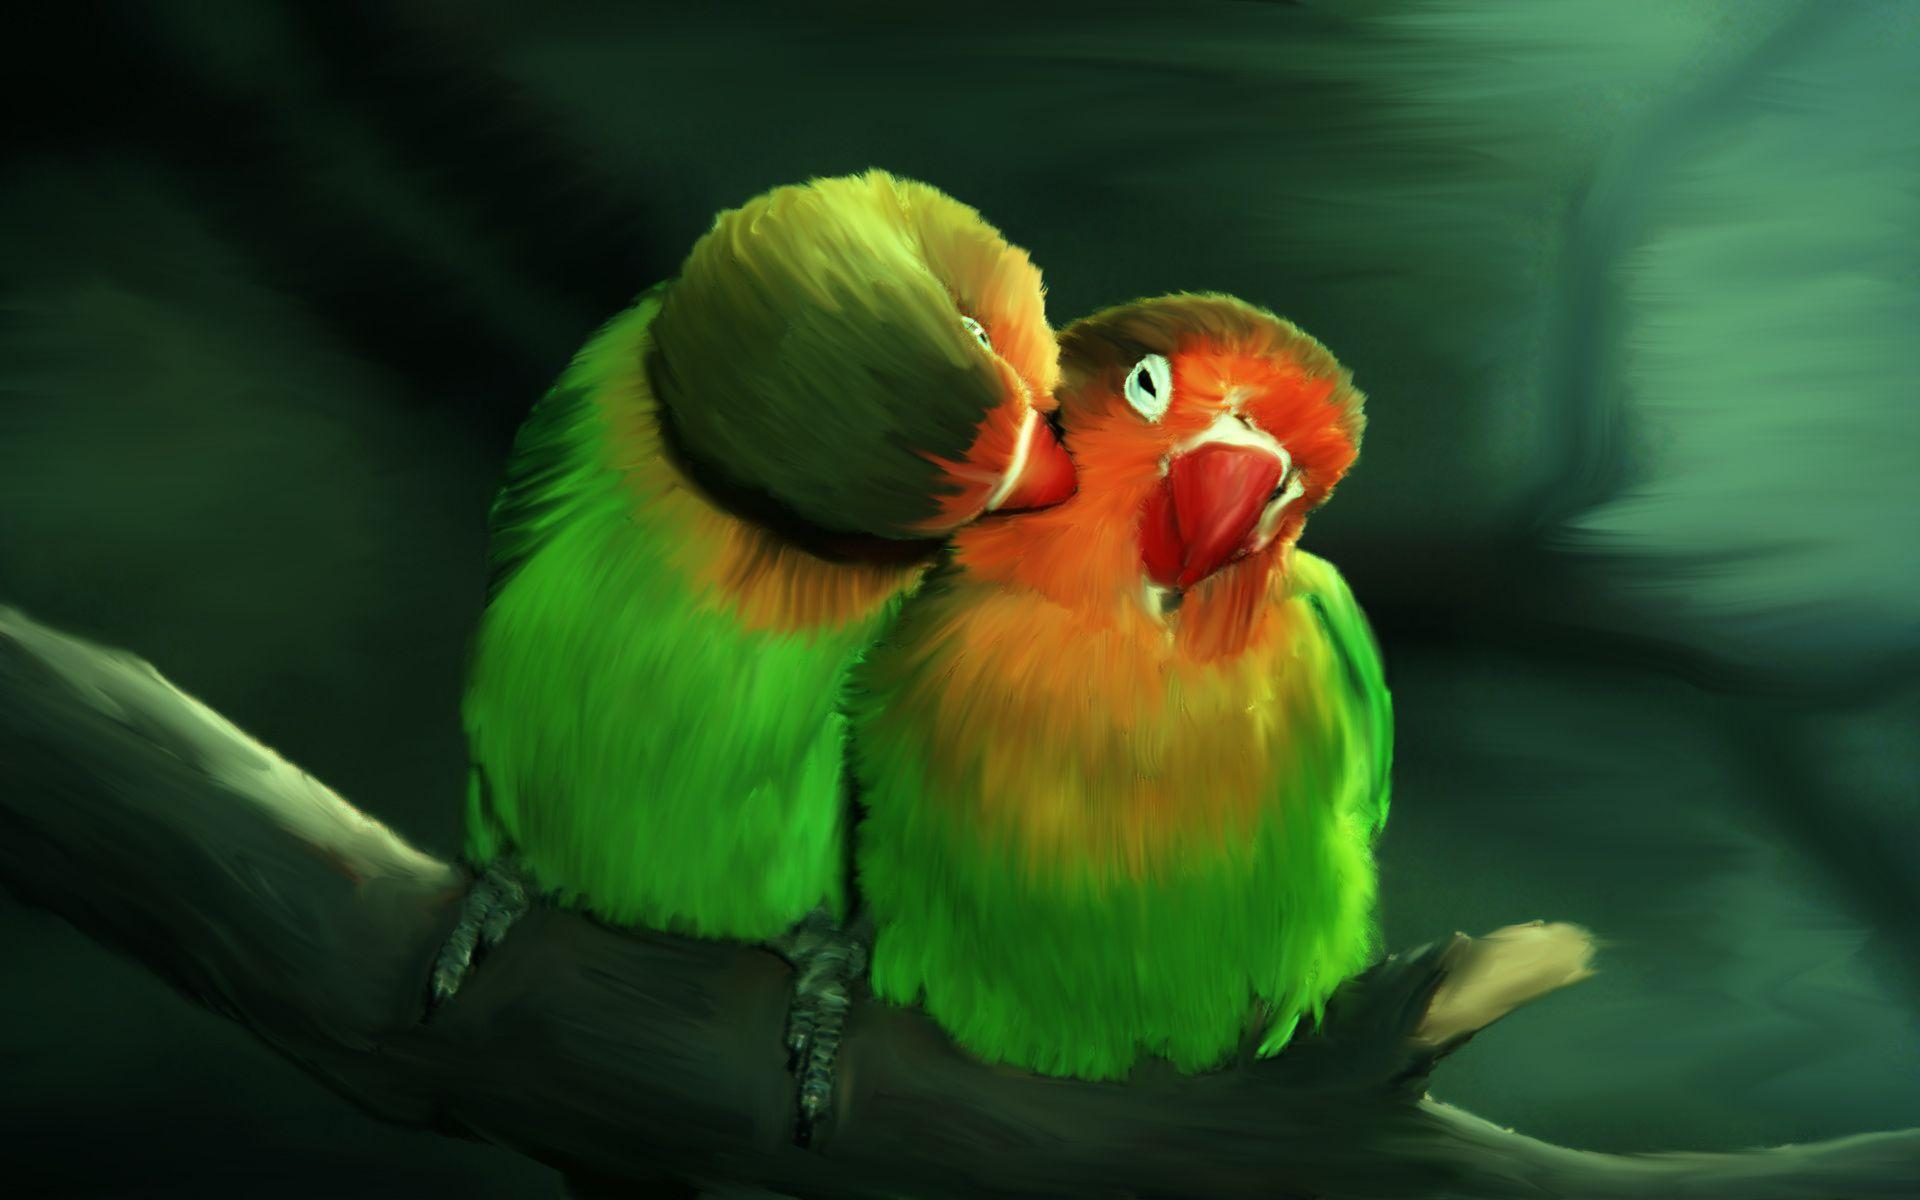 green Lovely Birds Wallpapers